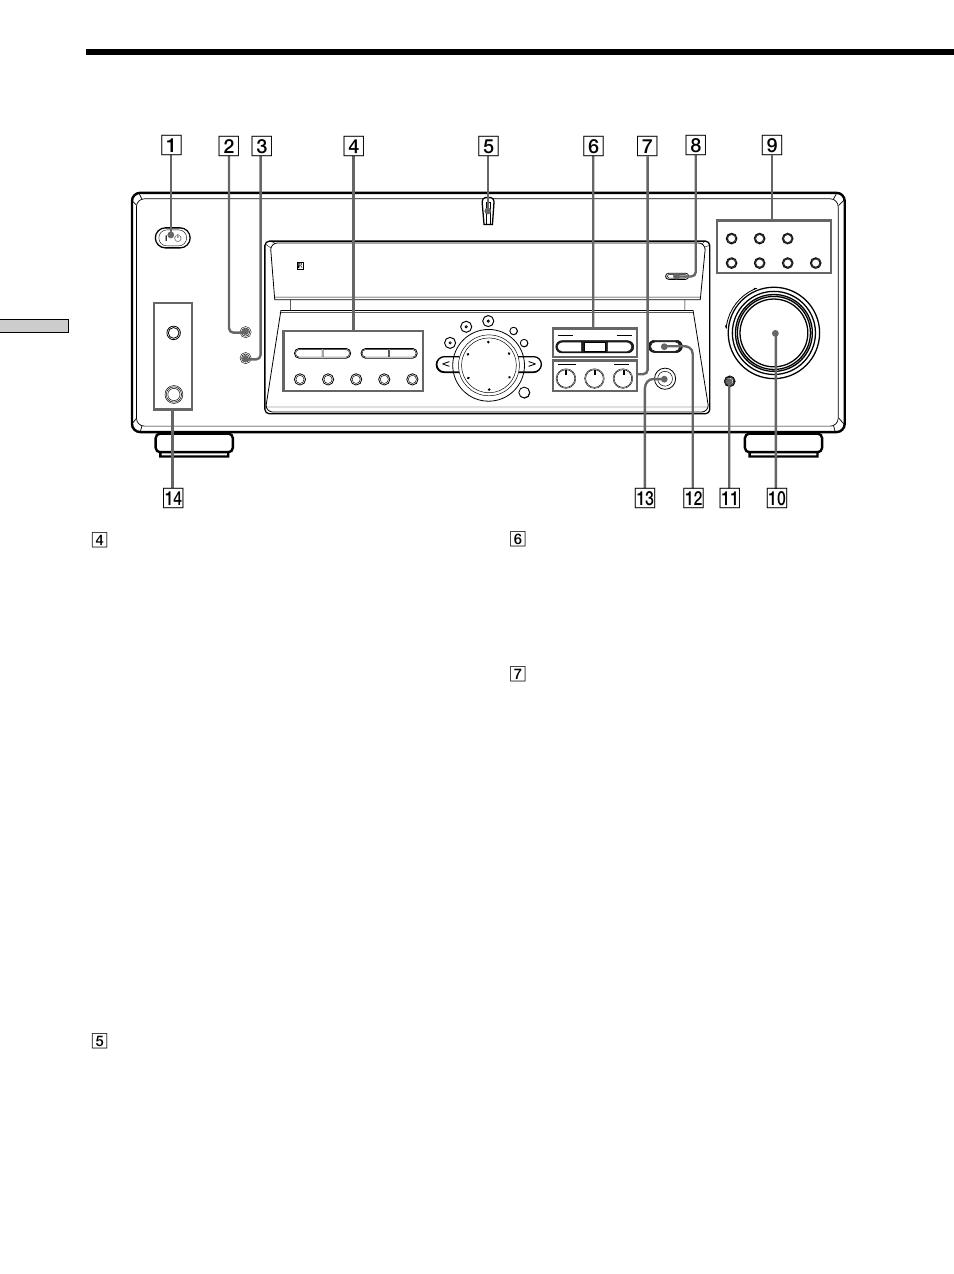 front panel parts description location of parts and basic amplifier rh manualsdir com Sony Handycam Manual Philips Manuals